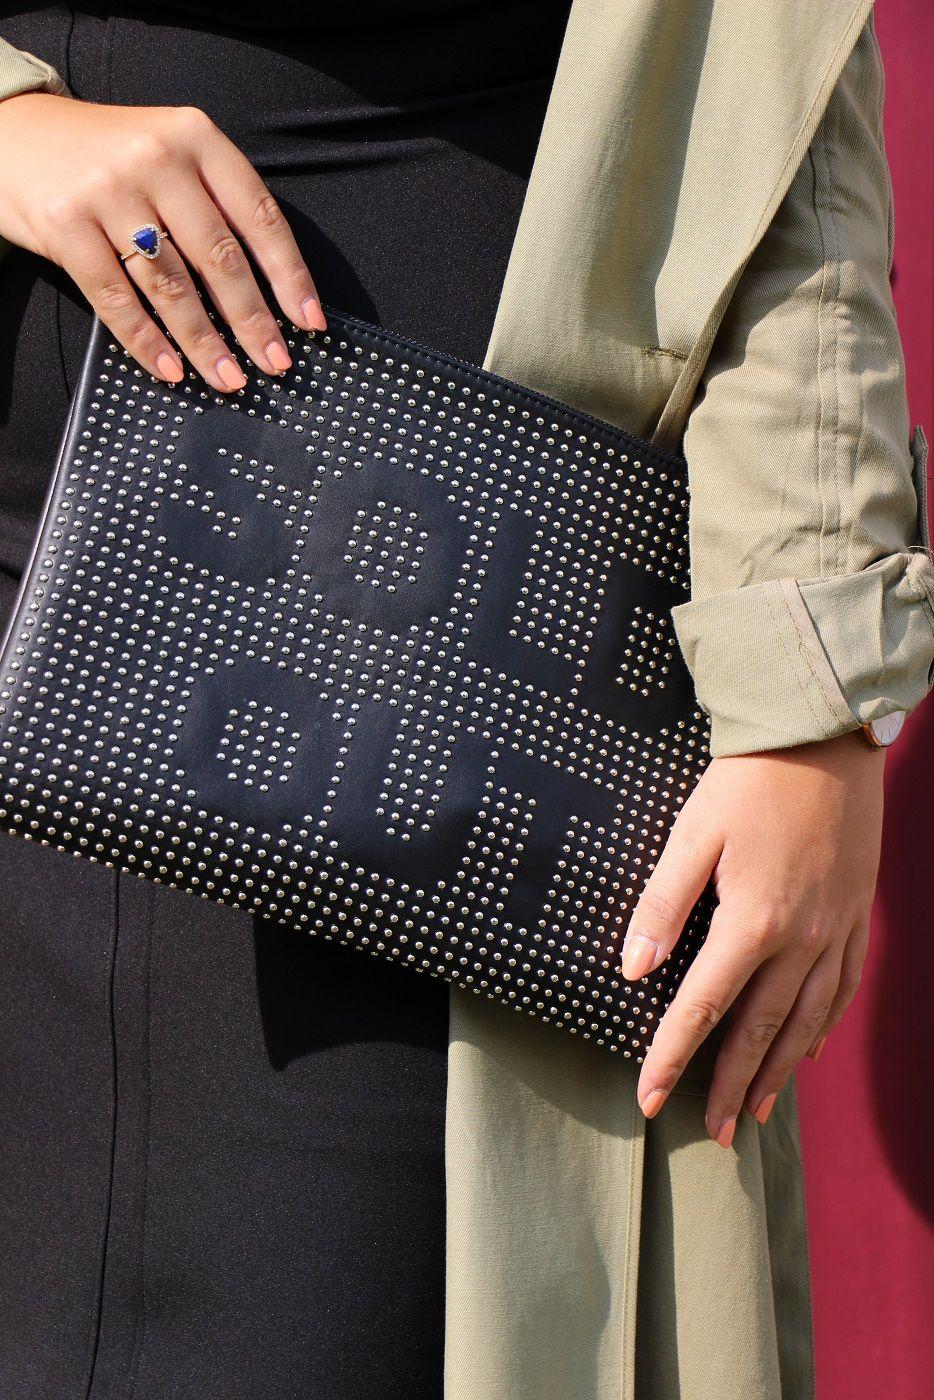 Zara details fall '15